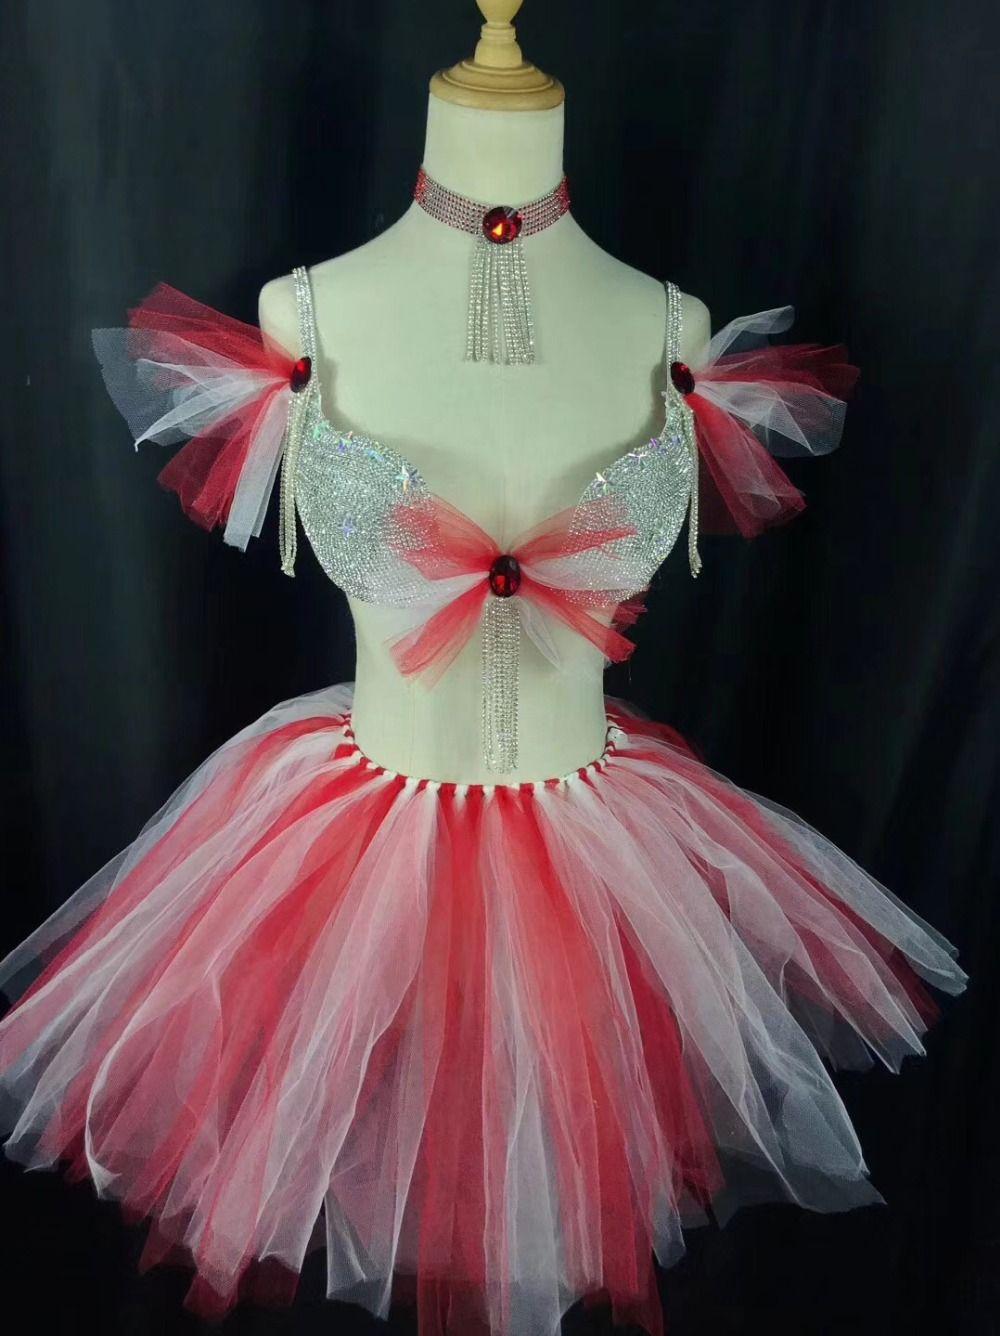 47f7c46a4f15 2019 Pink Red Dance Wear Women S Sexy Dance Tutu Dress Costumes ...